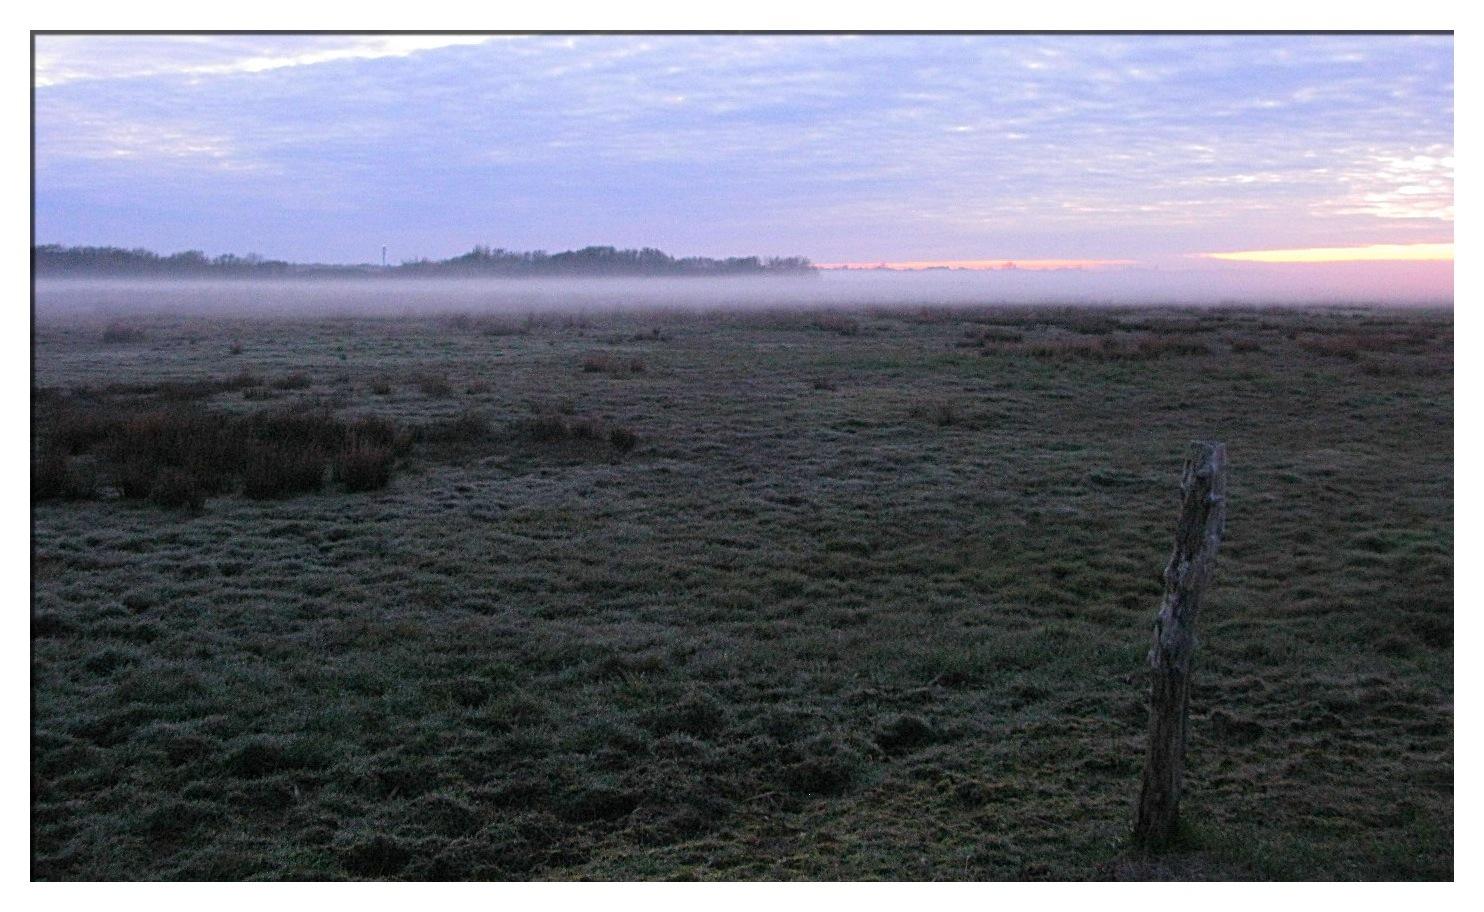 Morgens um Sechs vor Westerland